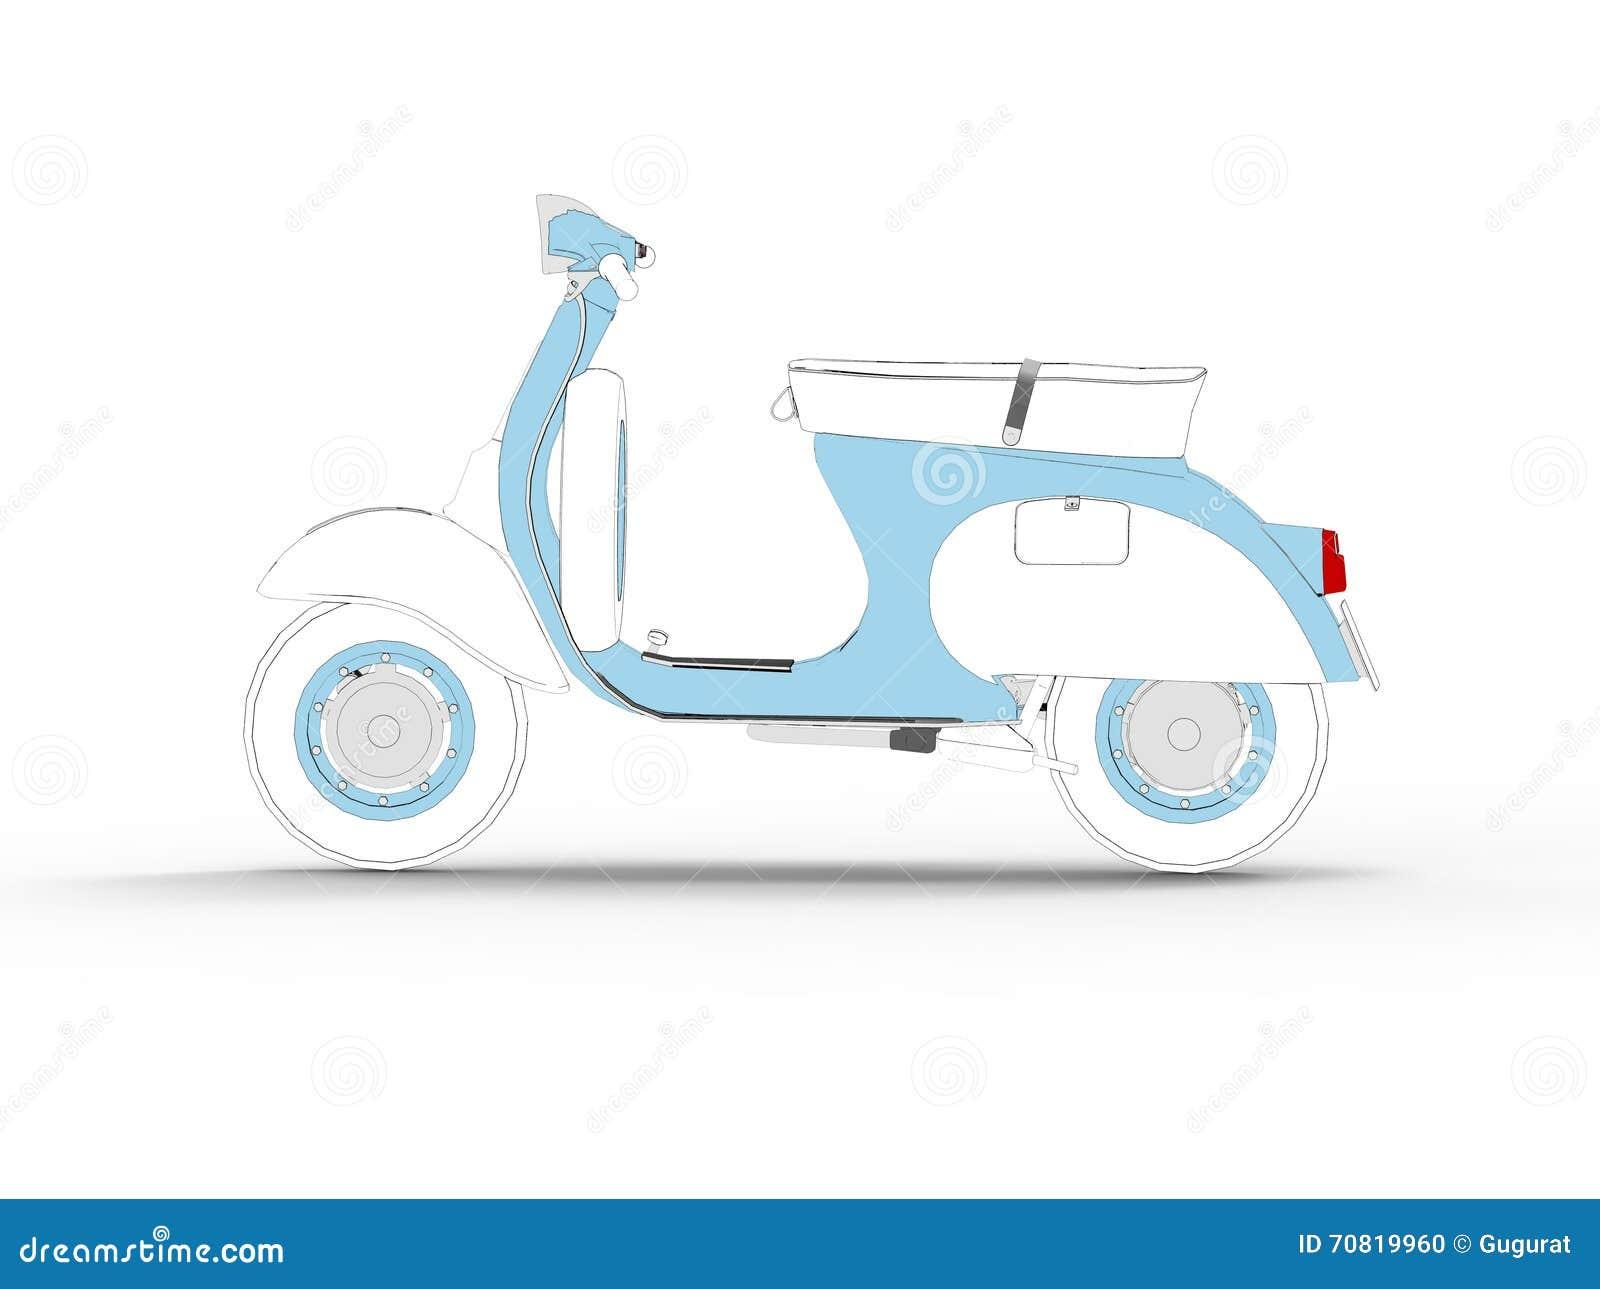 Draw Motor Scooter Symbol stock illustration. Illustration of land ...